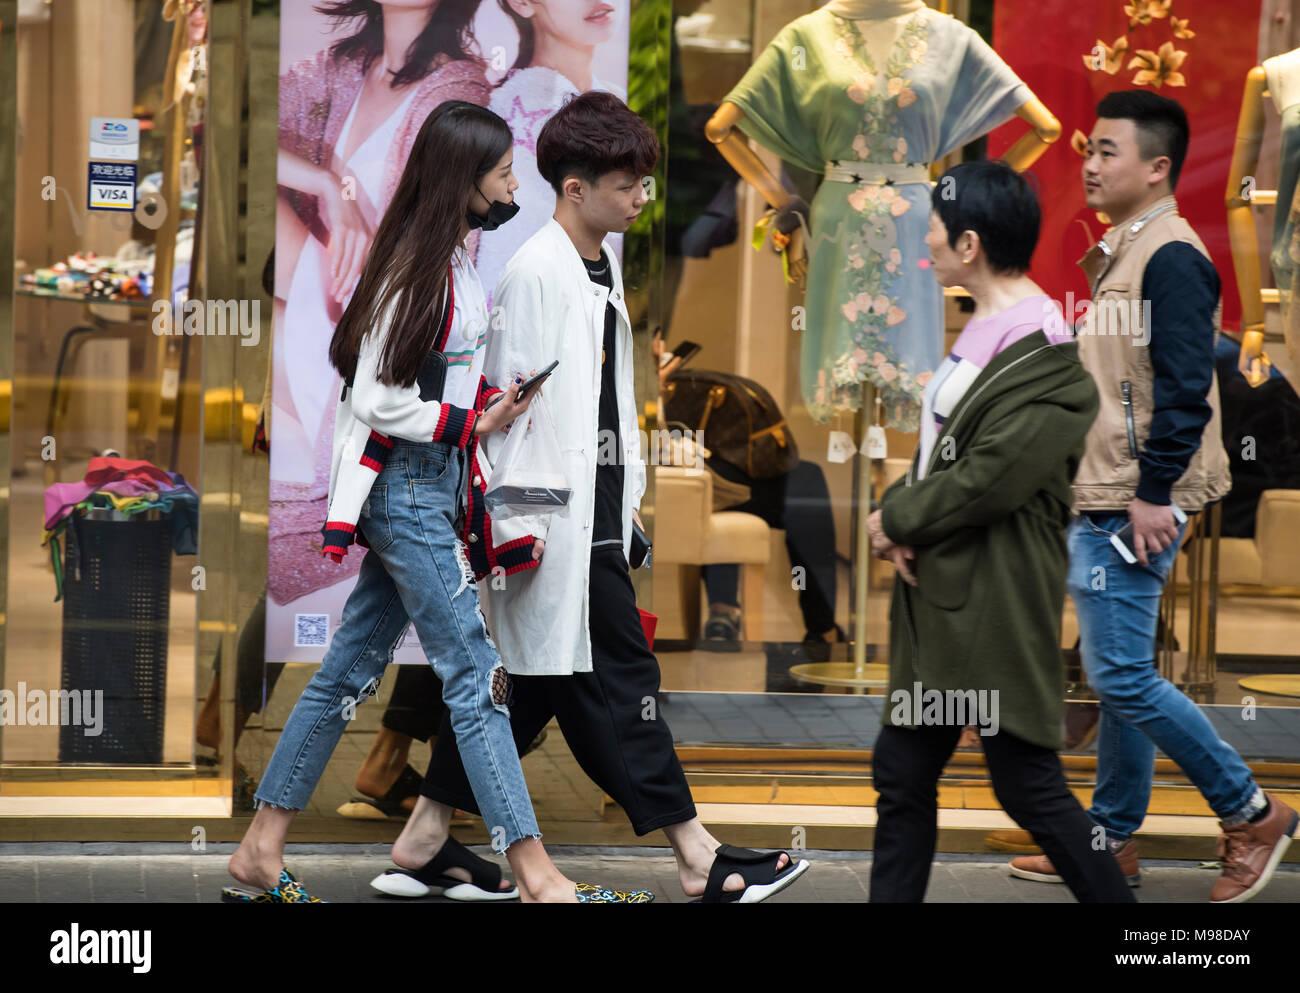 People walking along a main shopping street in Shanghai, China - Stock Image